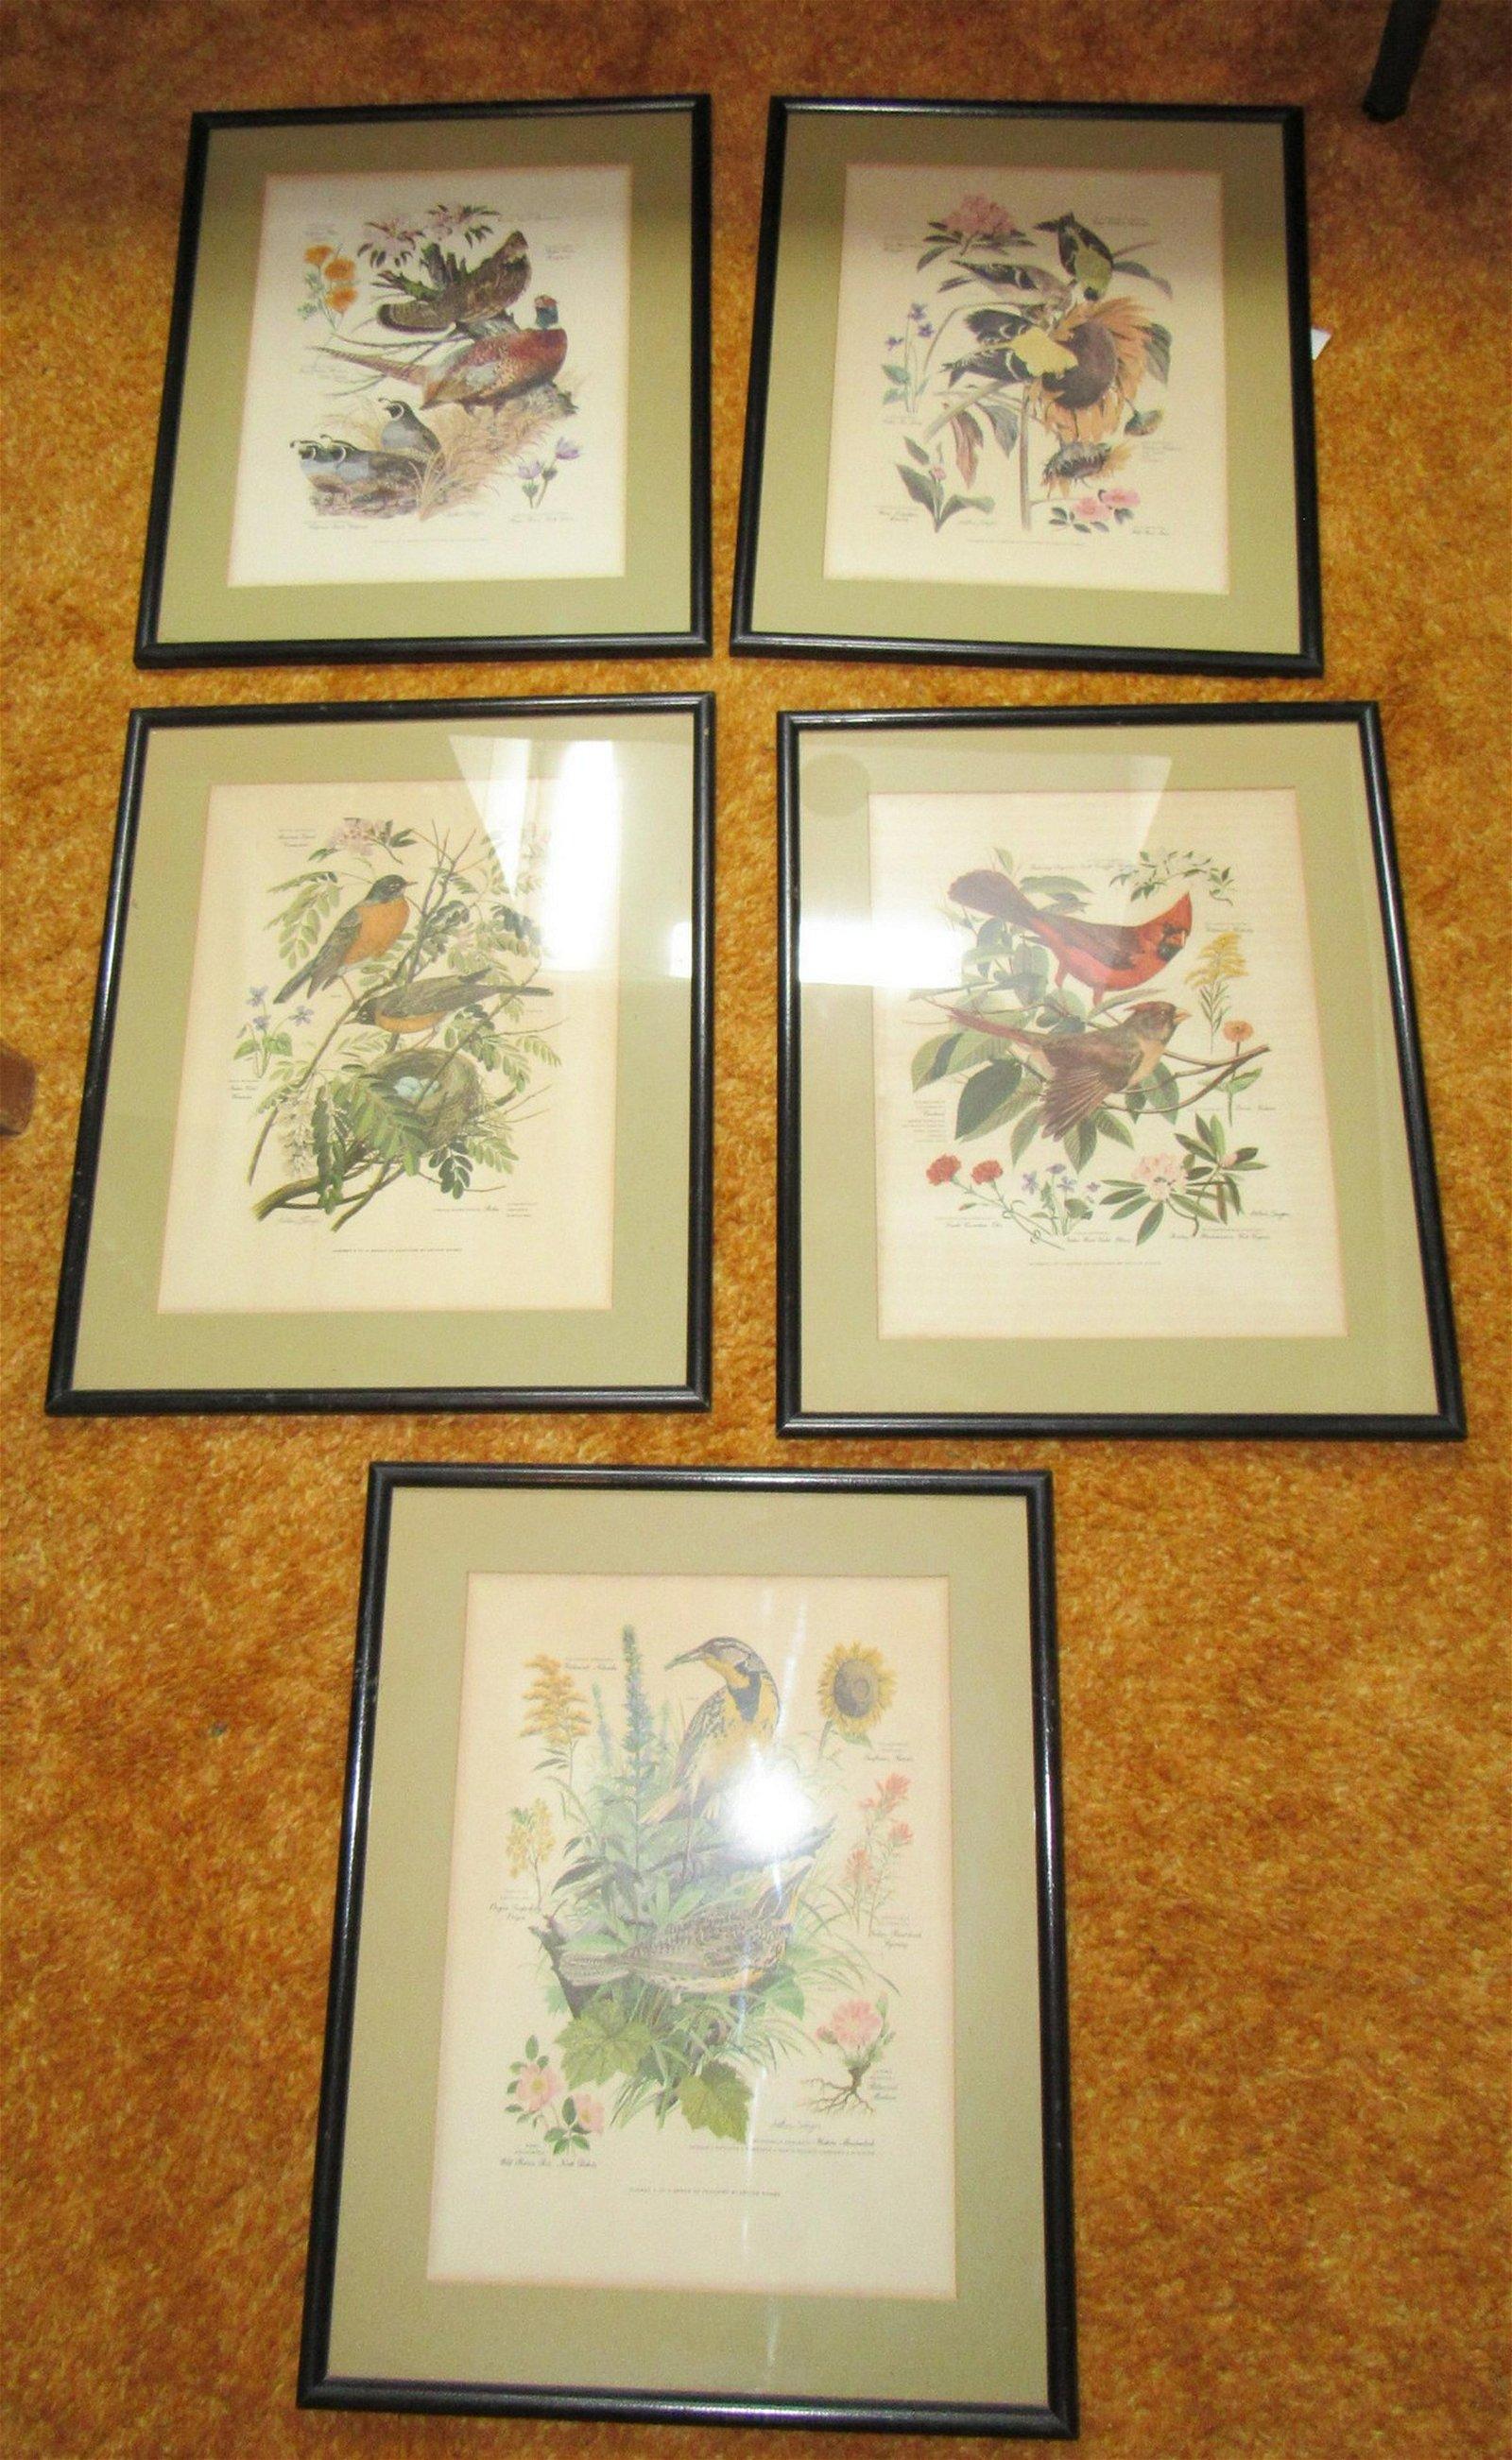 5 Arthur Singer Prints